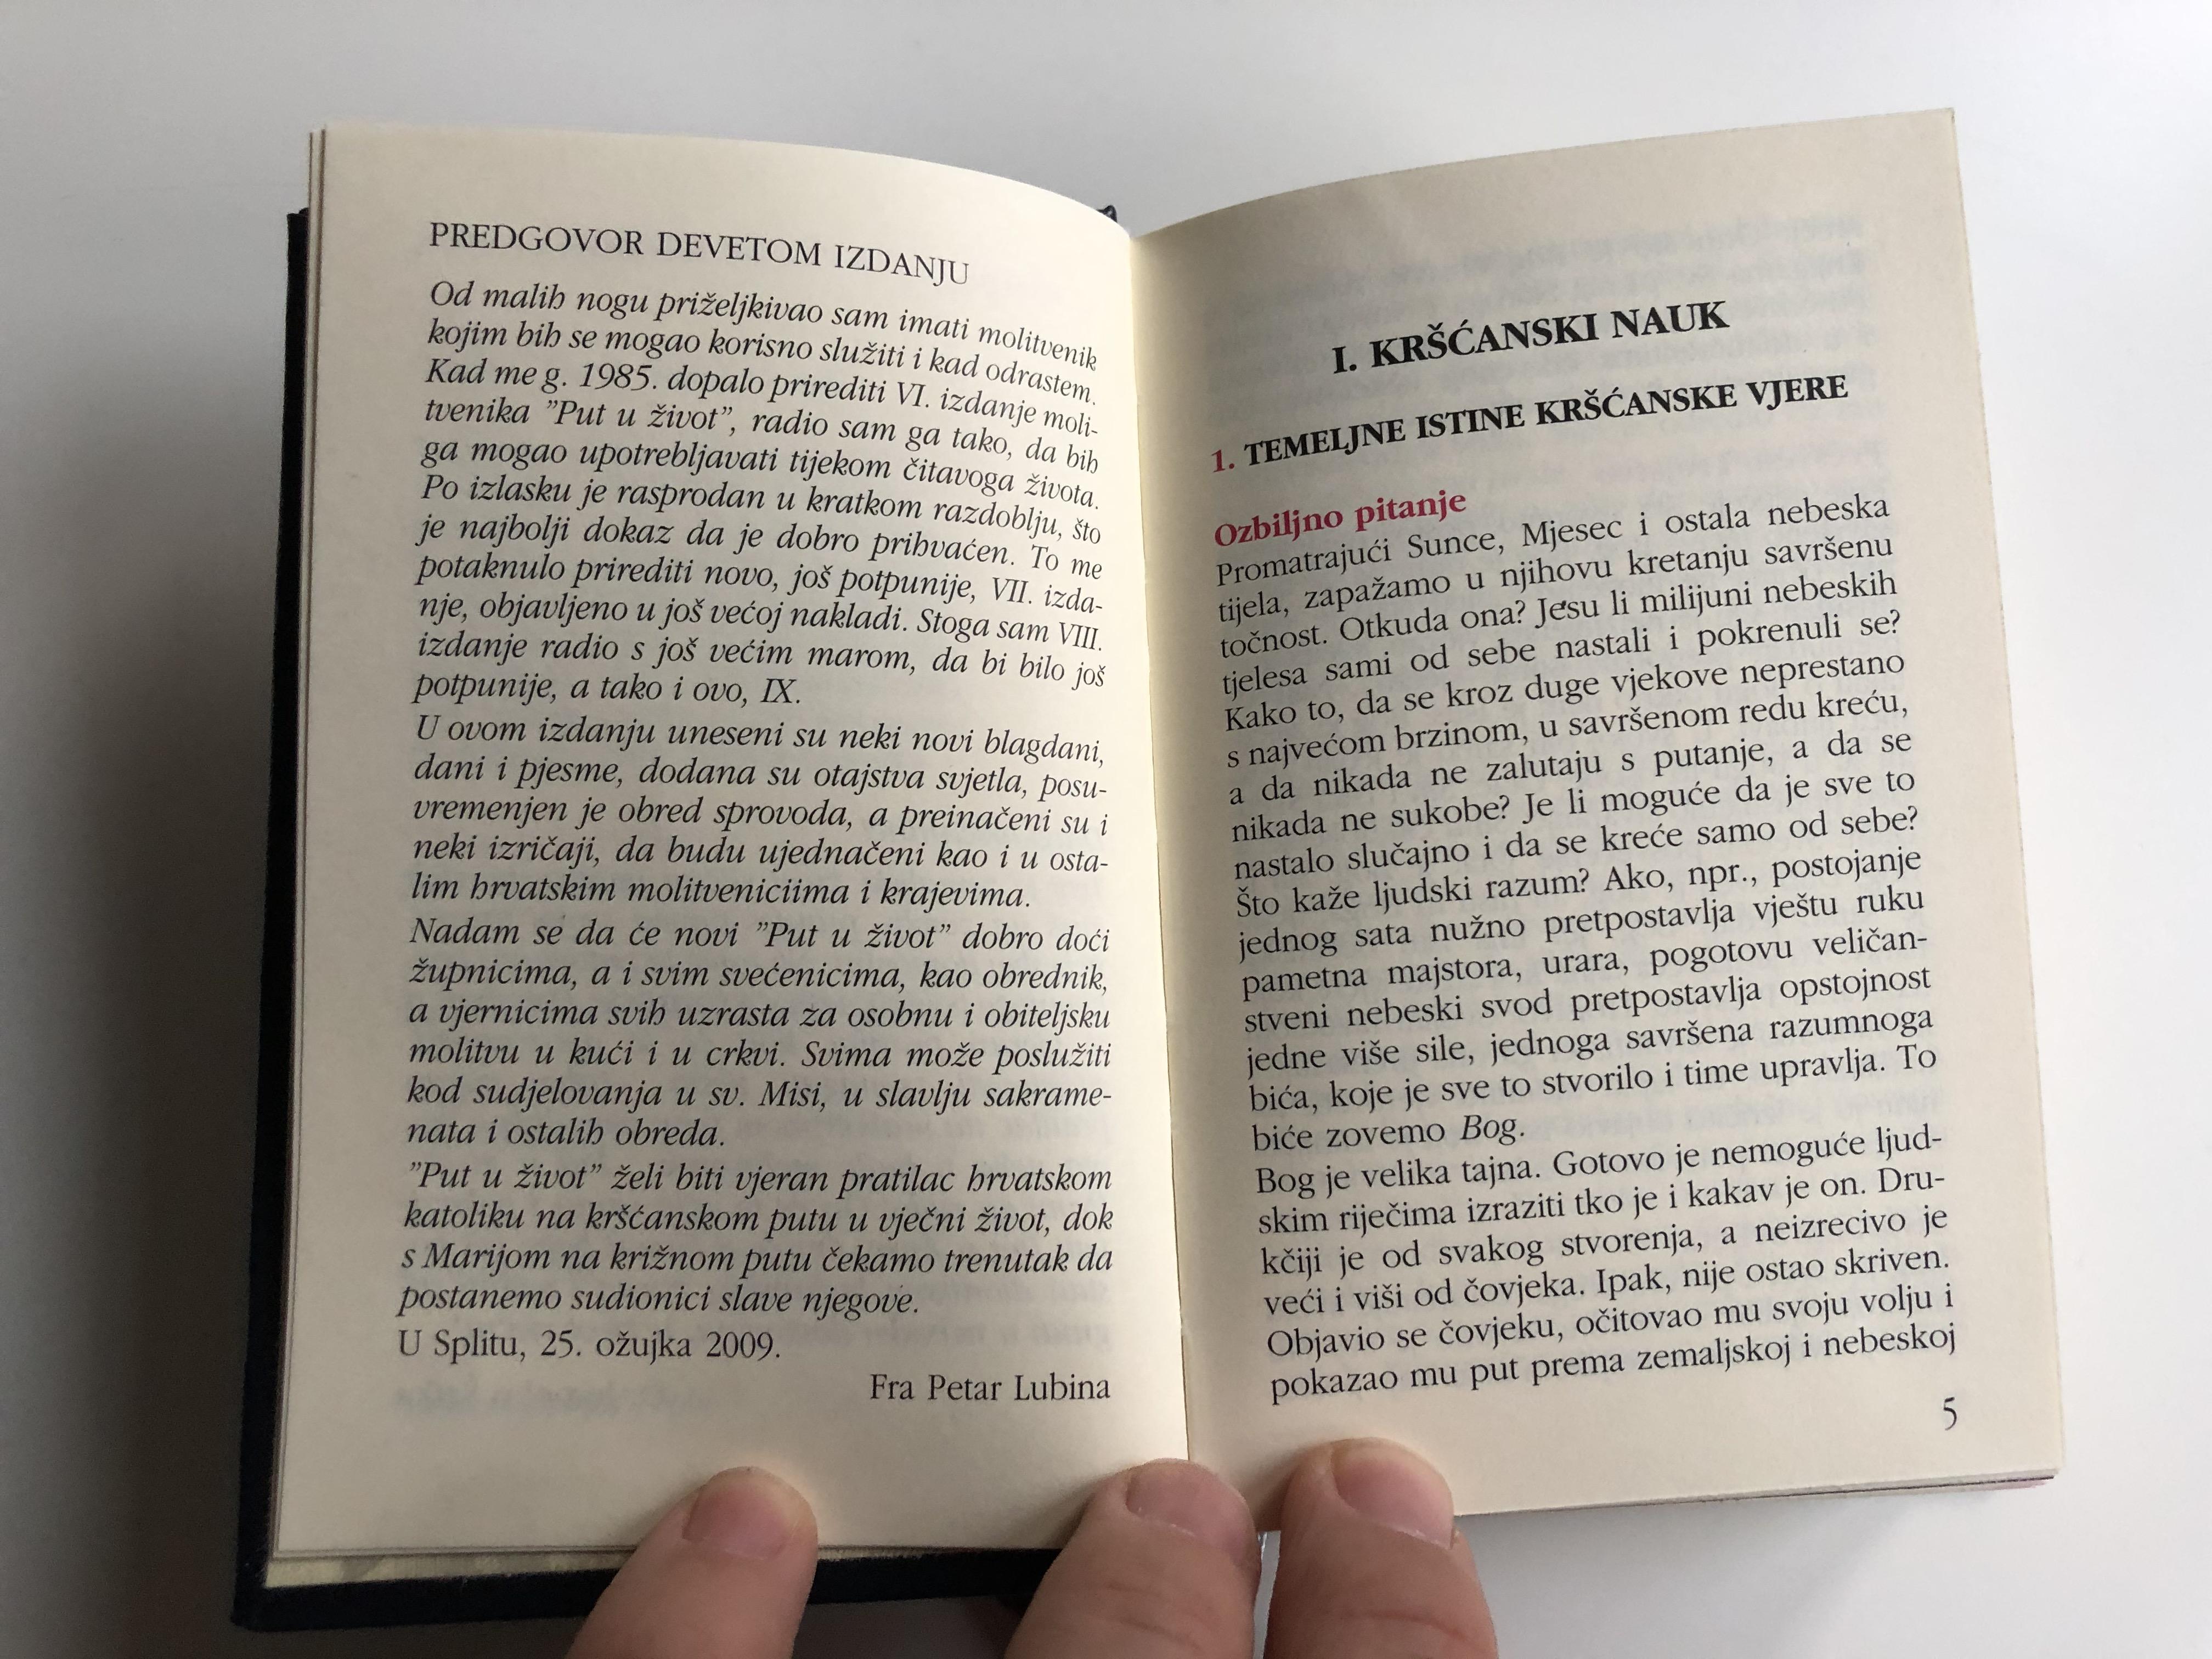 put-u-ivot-way-of-life-prayer-and-rites-9th-amended-edition-hardcover-black-4.jpg